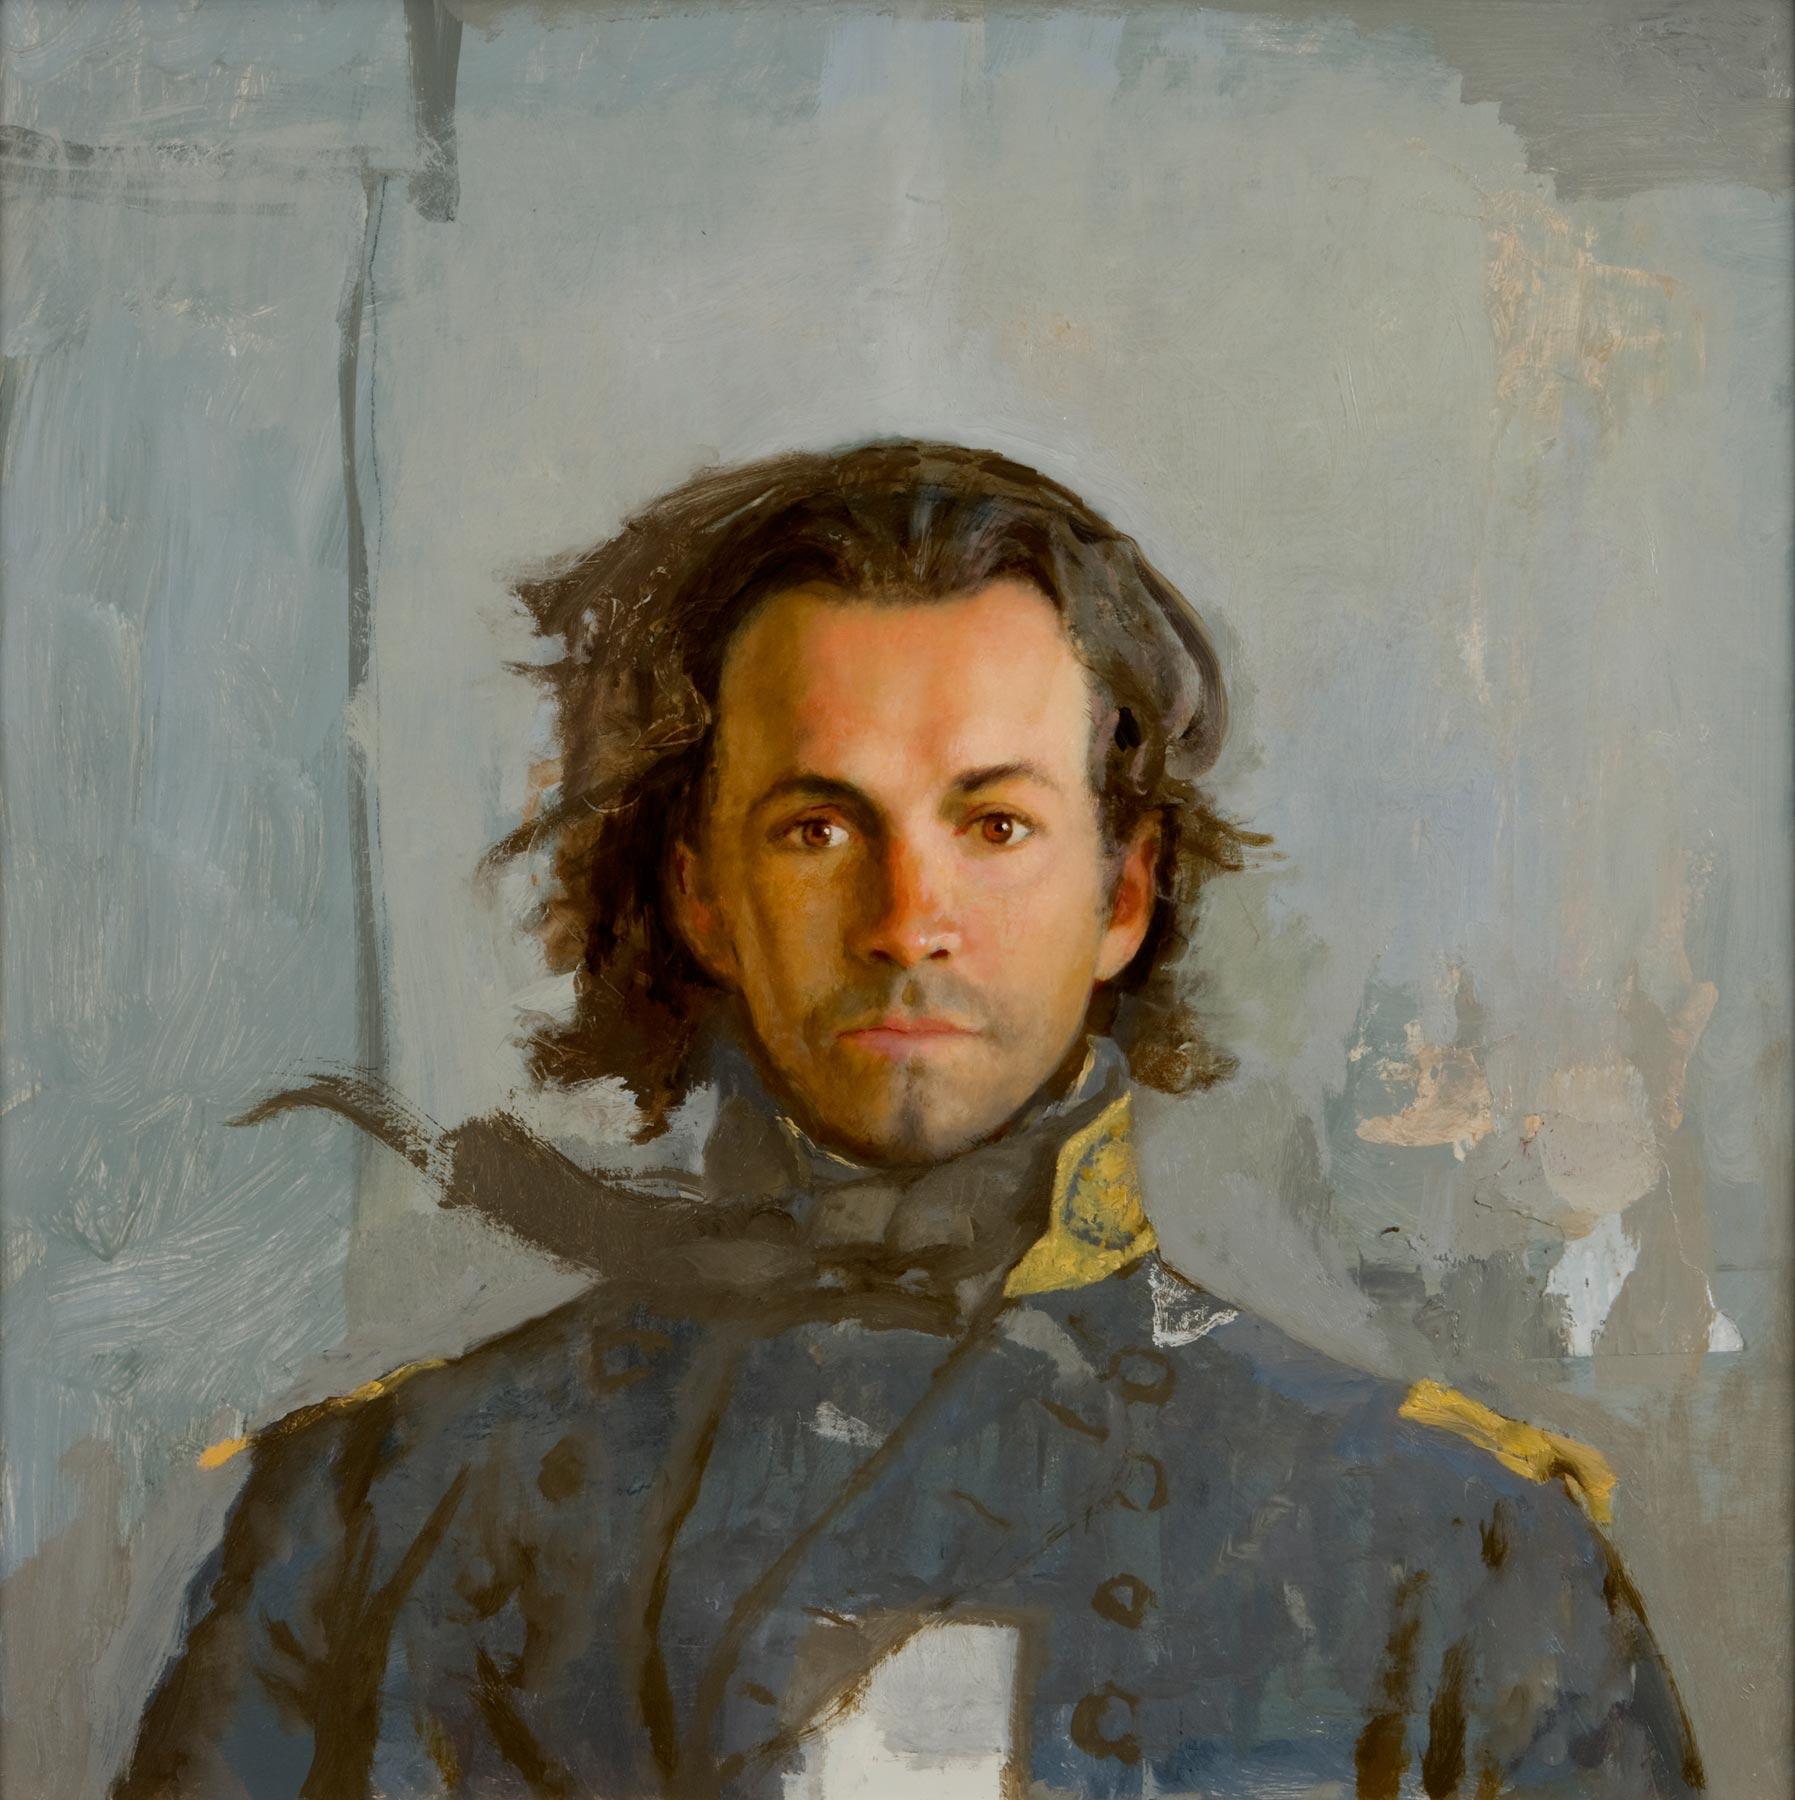 2008-the-confederate-lg